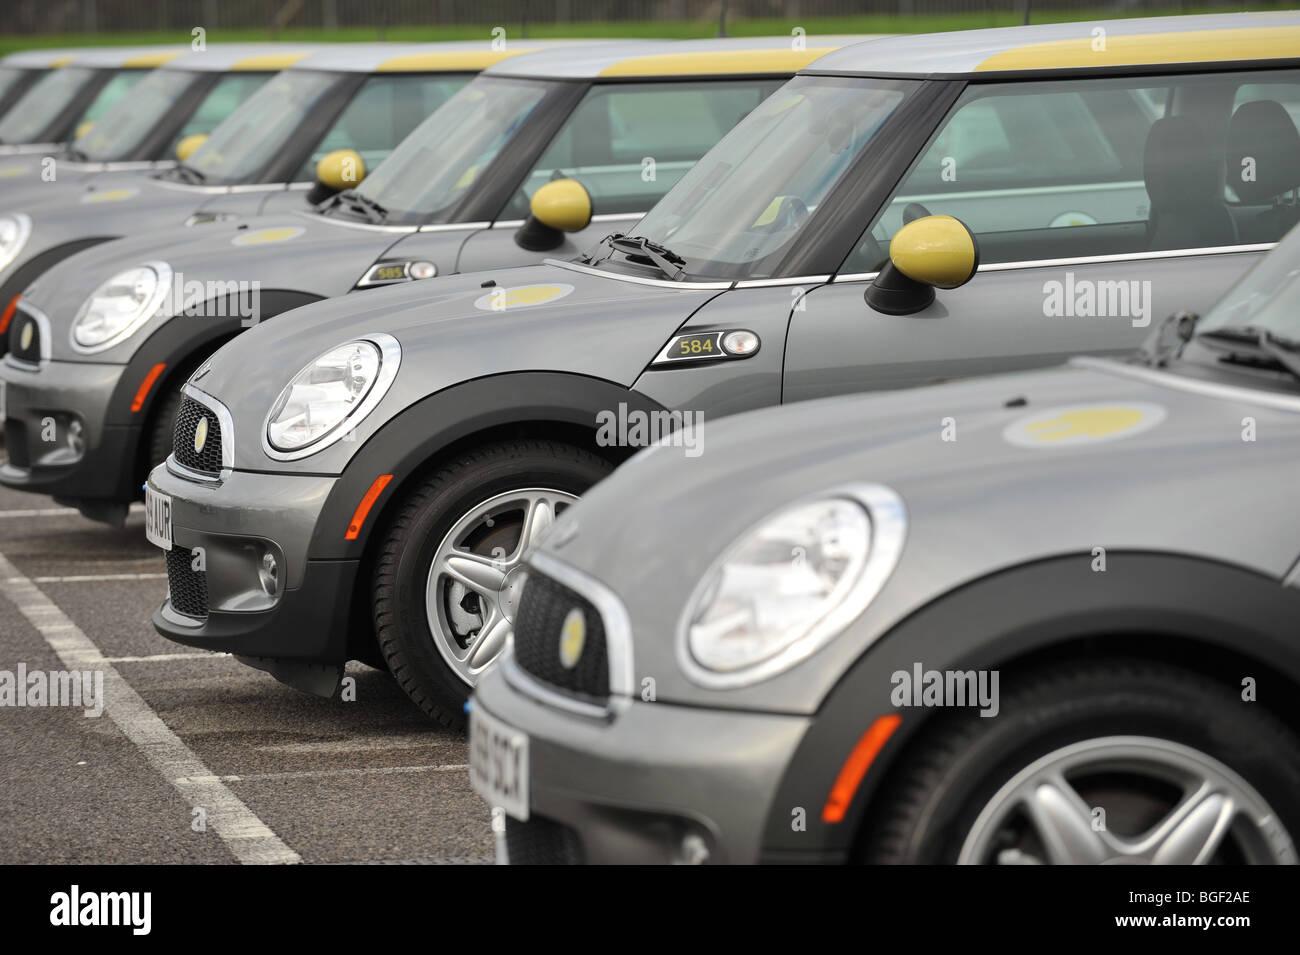 Electric Cars Stockfotos & Electric Cars Bilder - Alamy